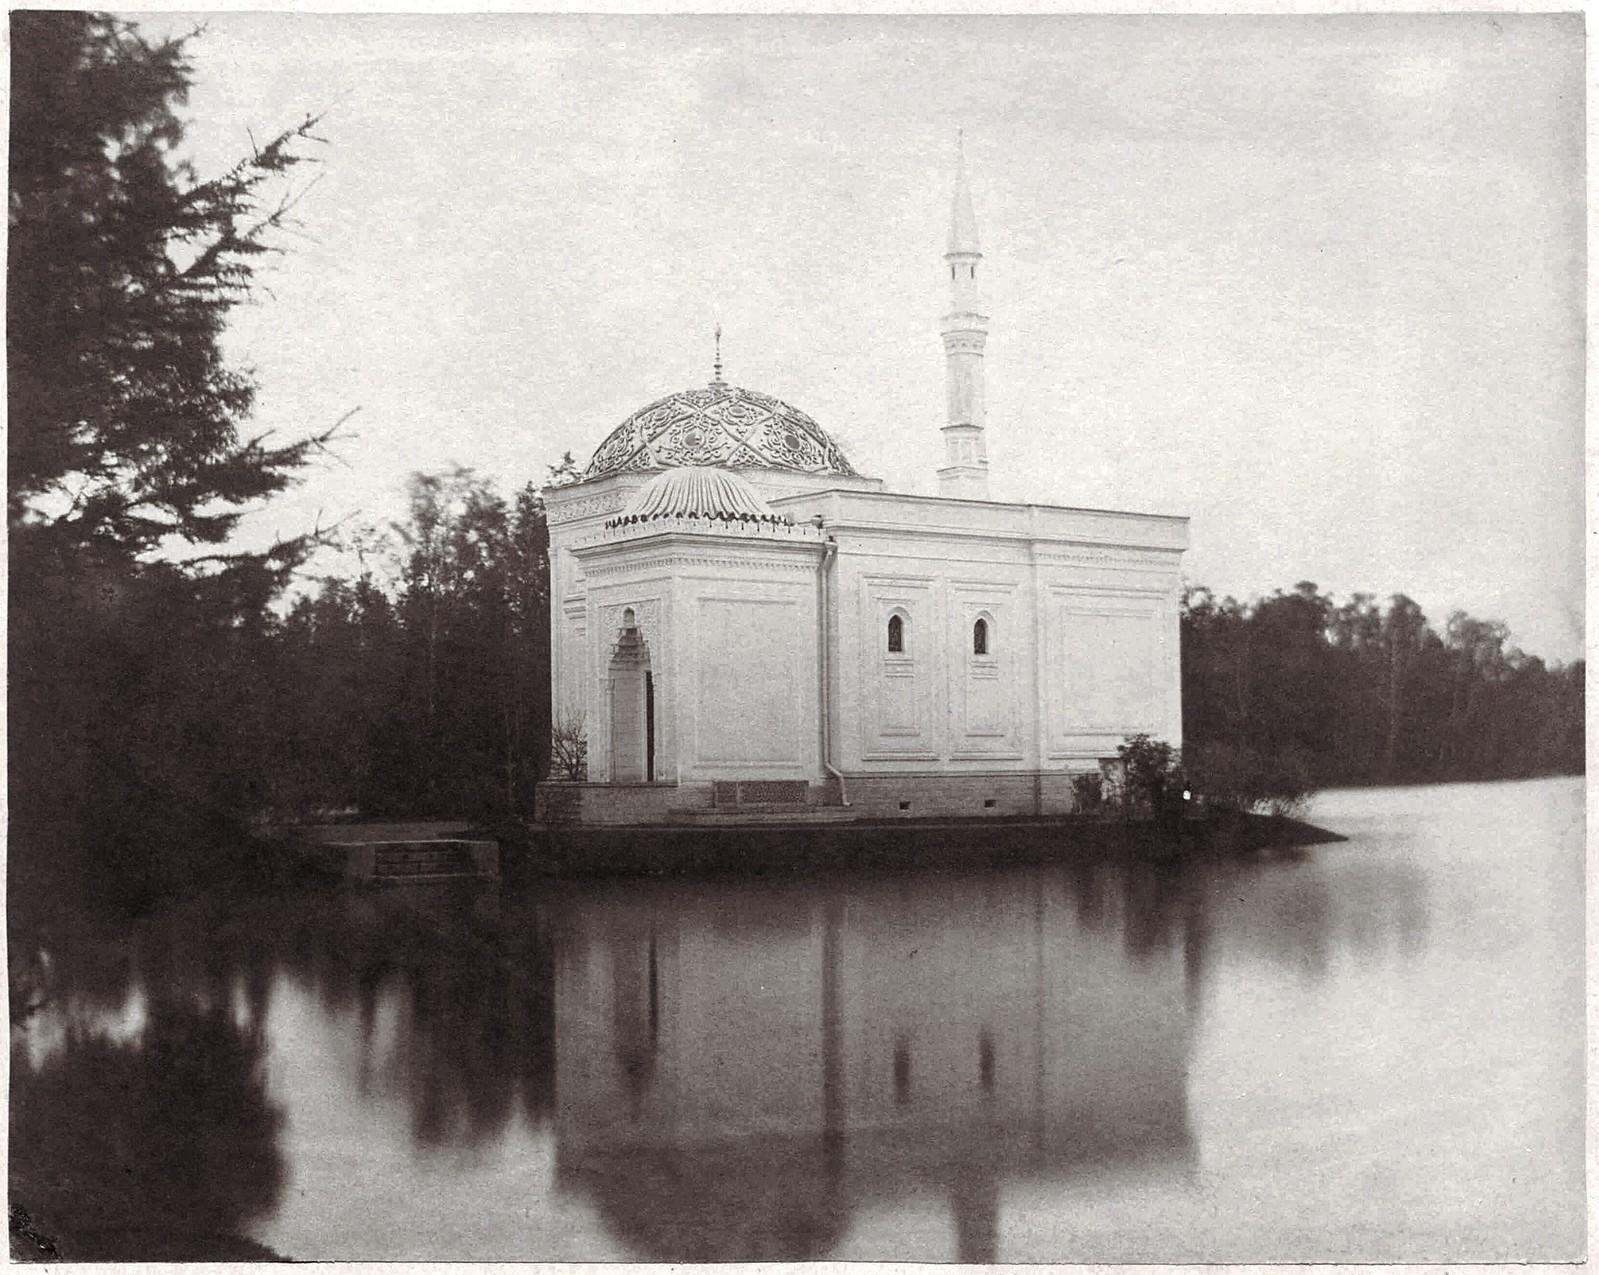 Царское село. Турецкая баня, вид с пруда. 1852